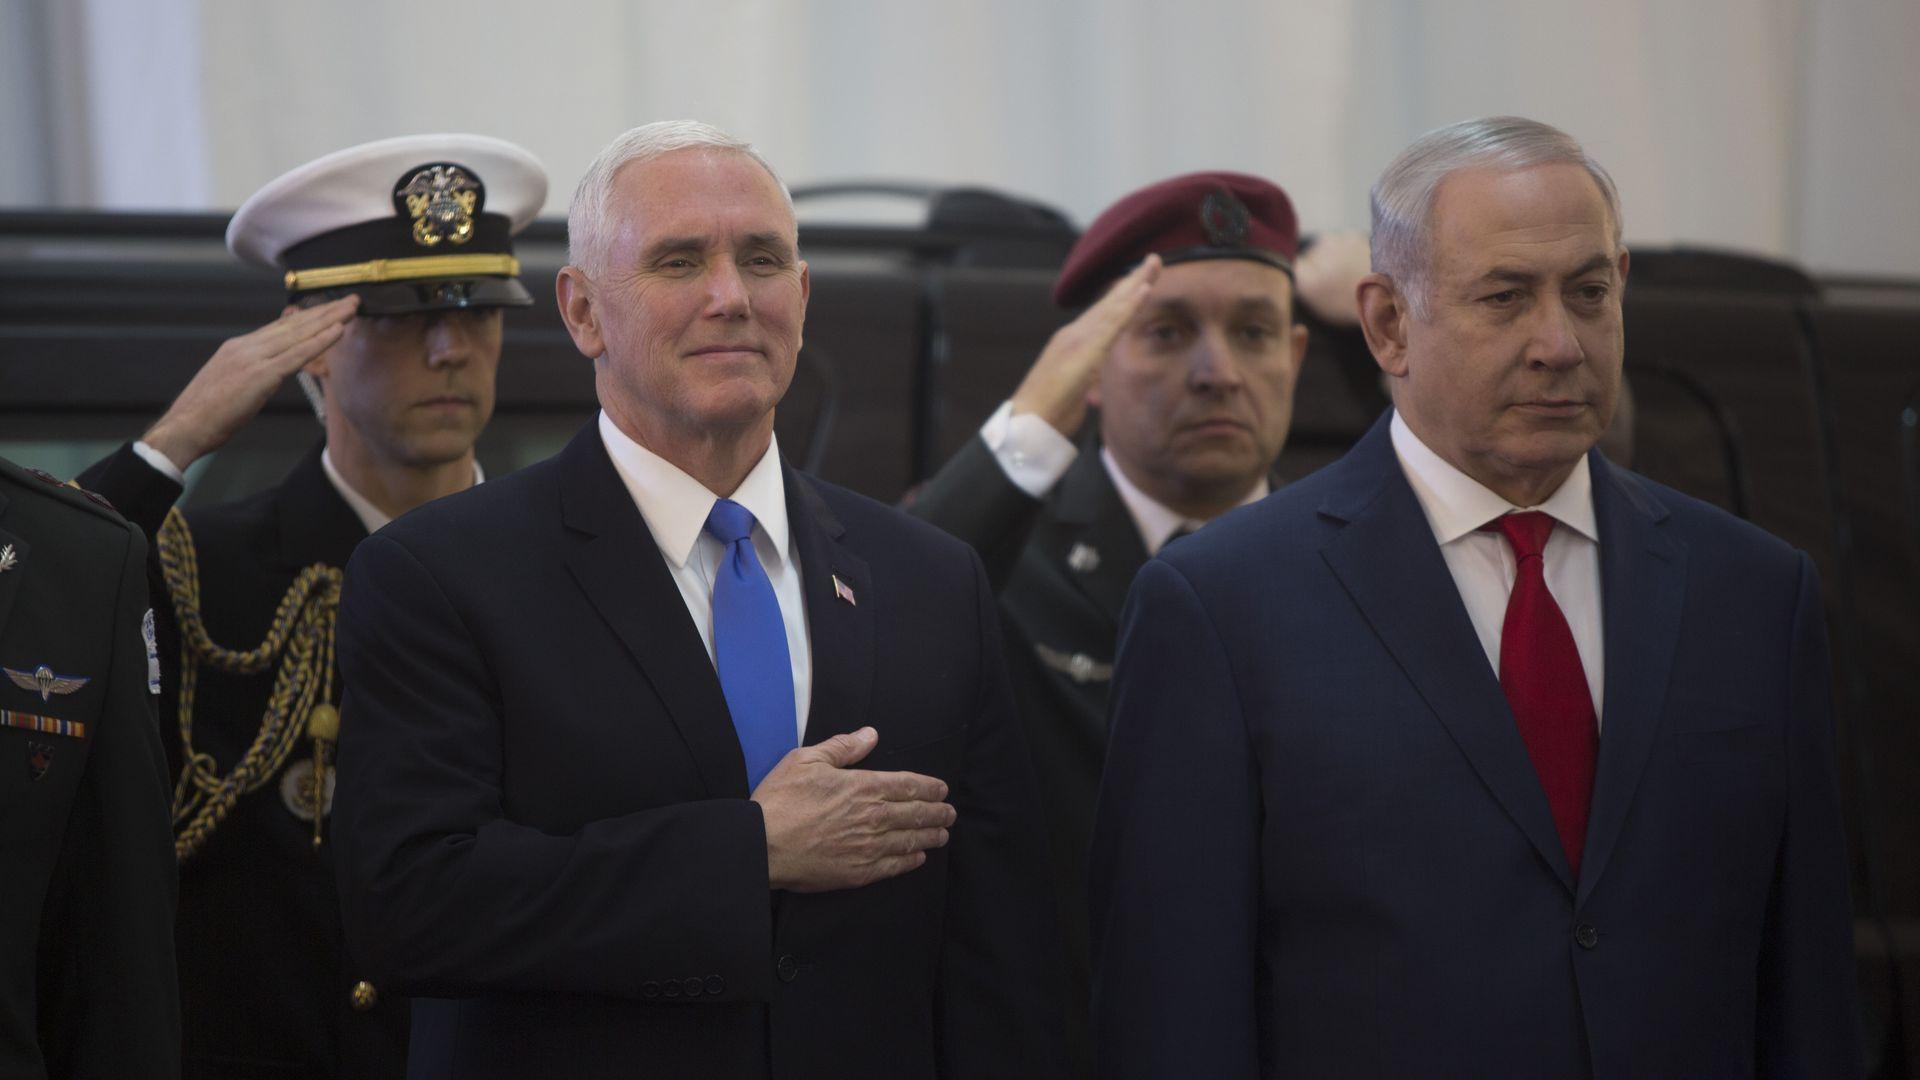 Vice President Mike Pence and Israeli Prime Minister Benjamin Netanyahu